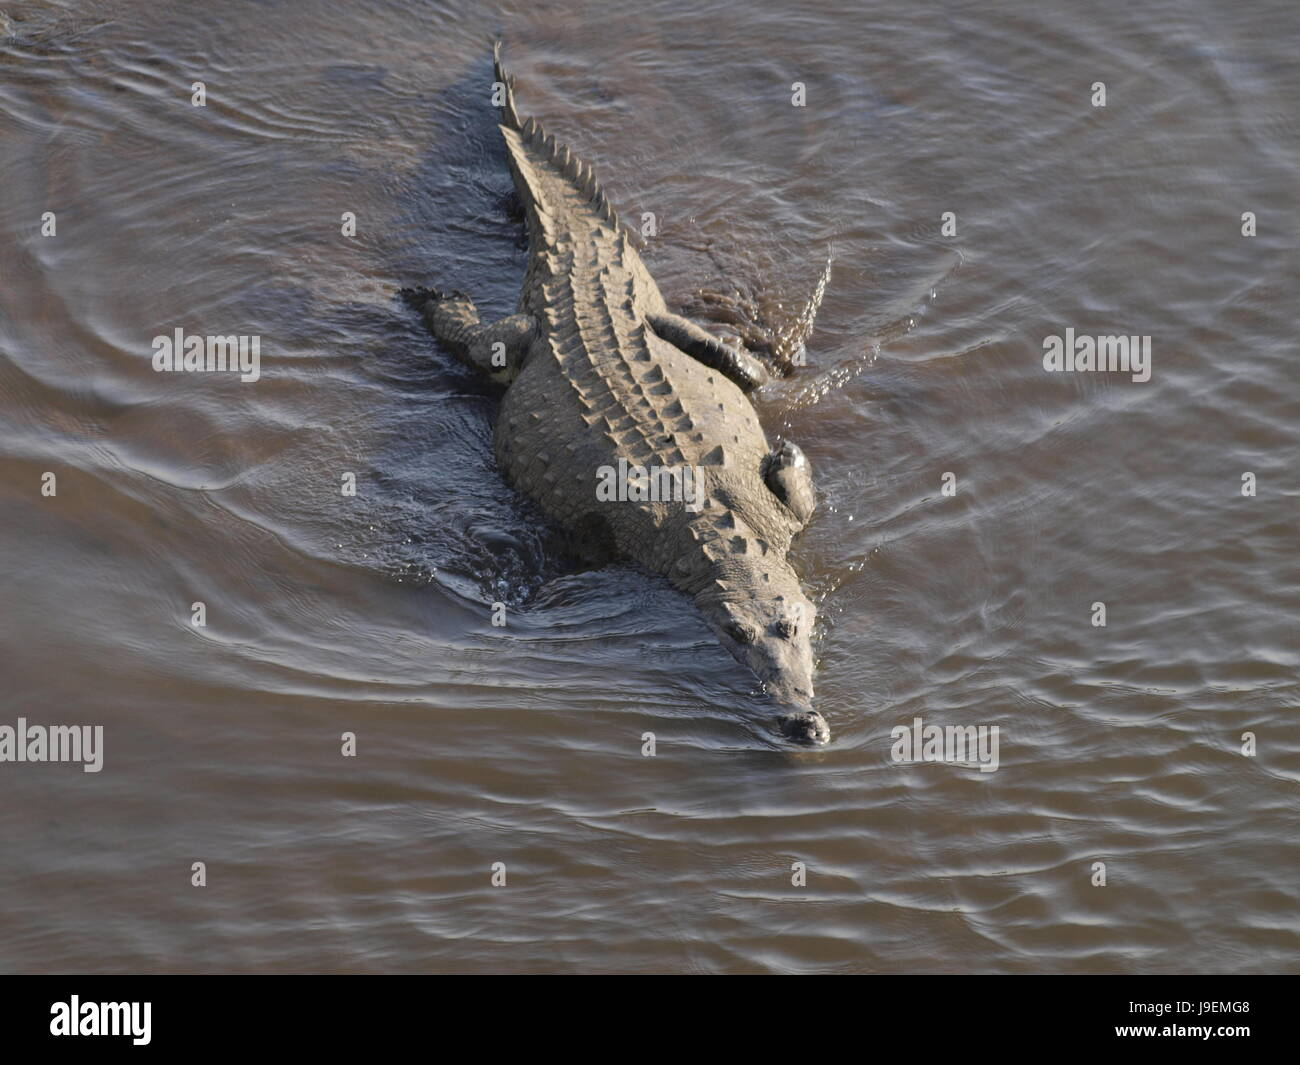 reptile, crocodile, saurian, reptiles, alligator, dangerous, reptile, wild, - Stock Image